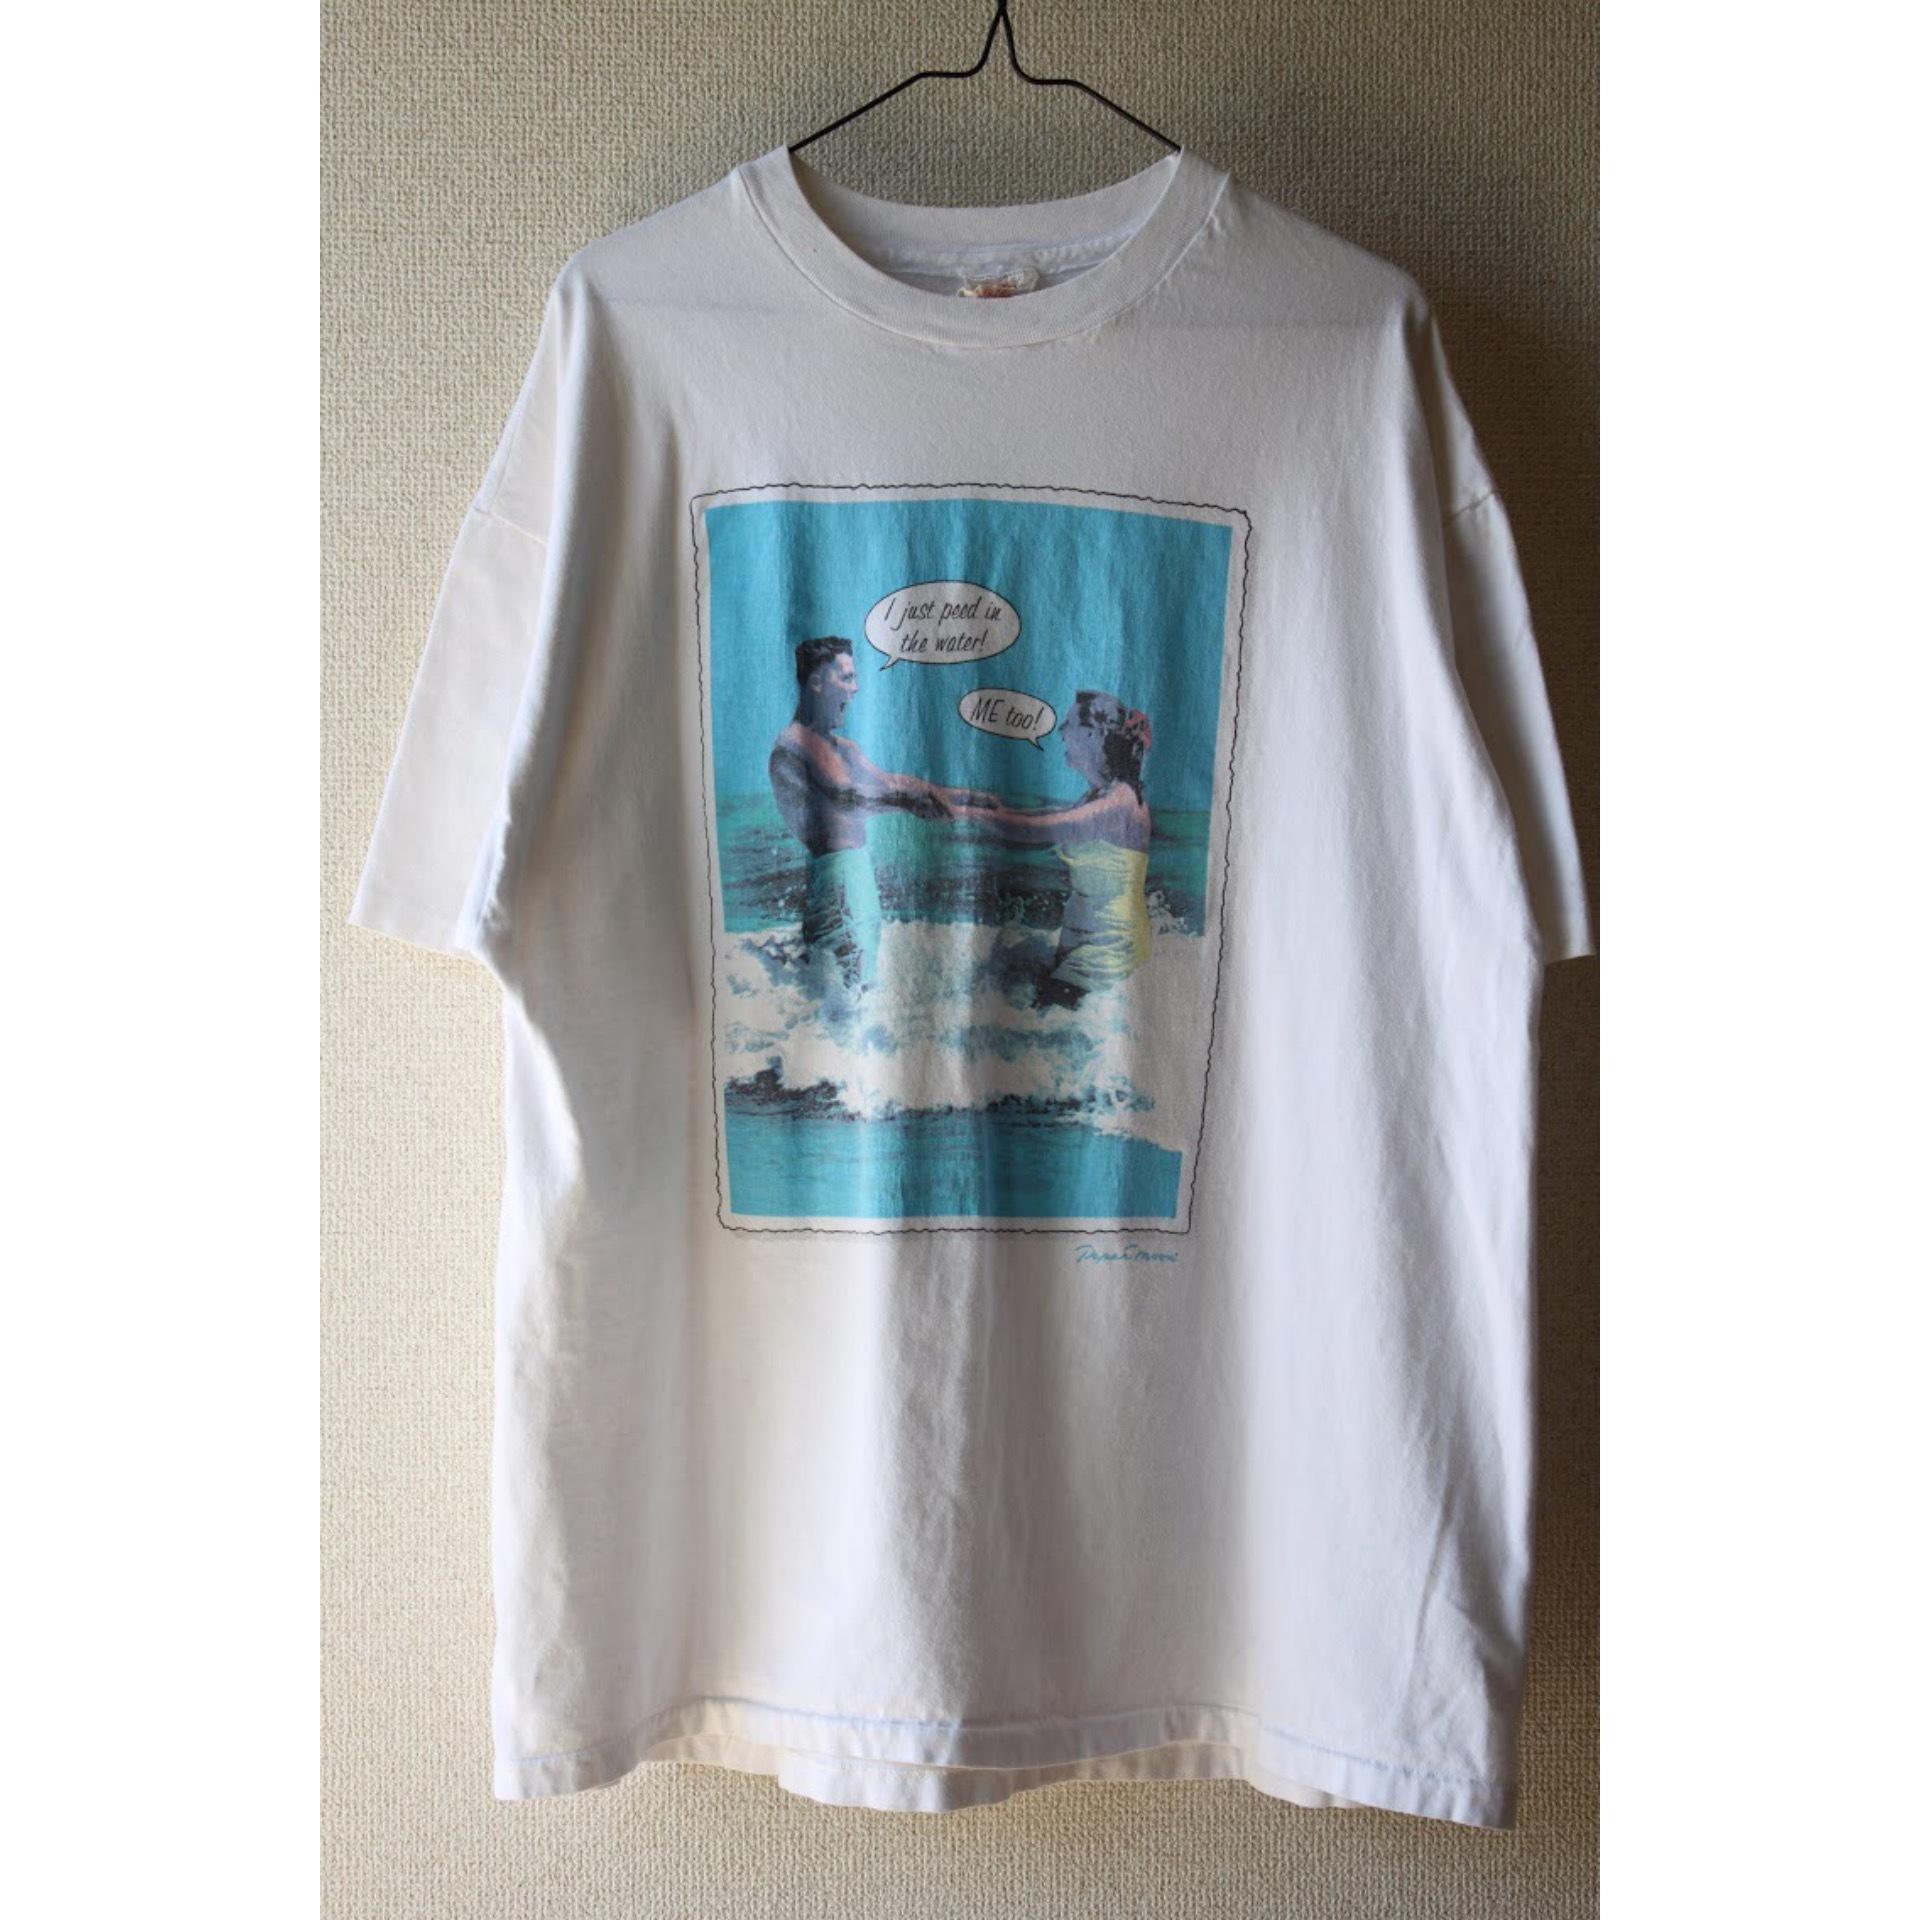 90s Funny photo t shirt